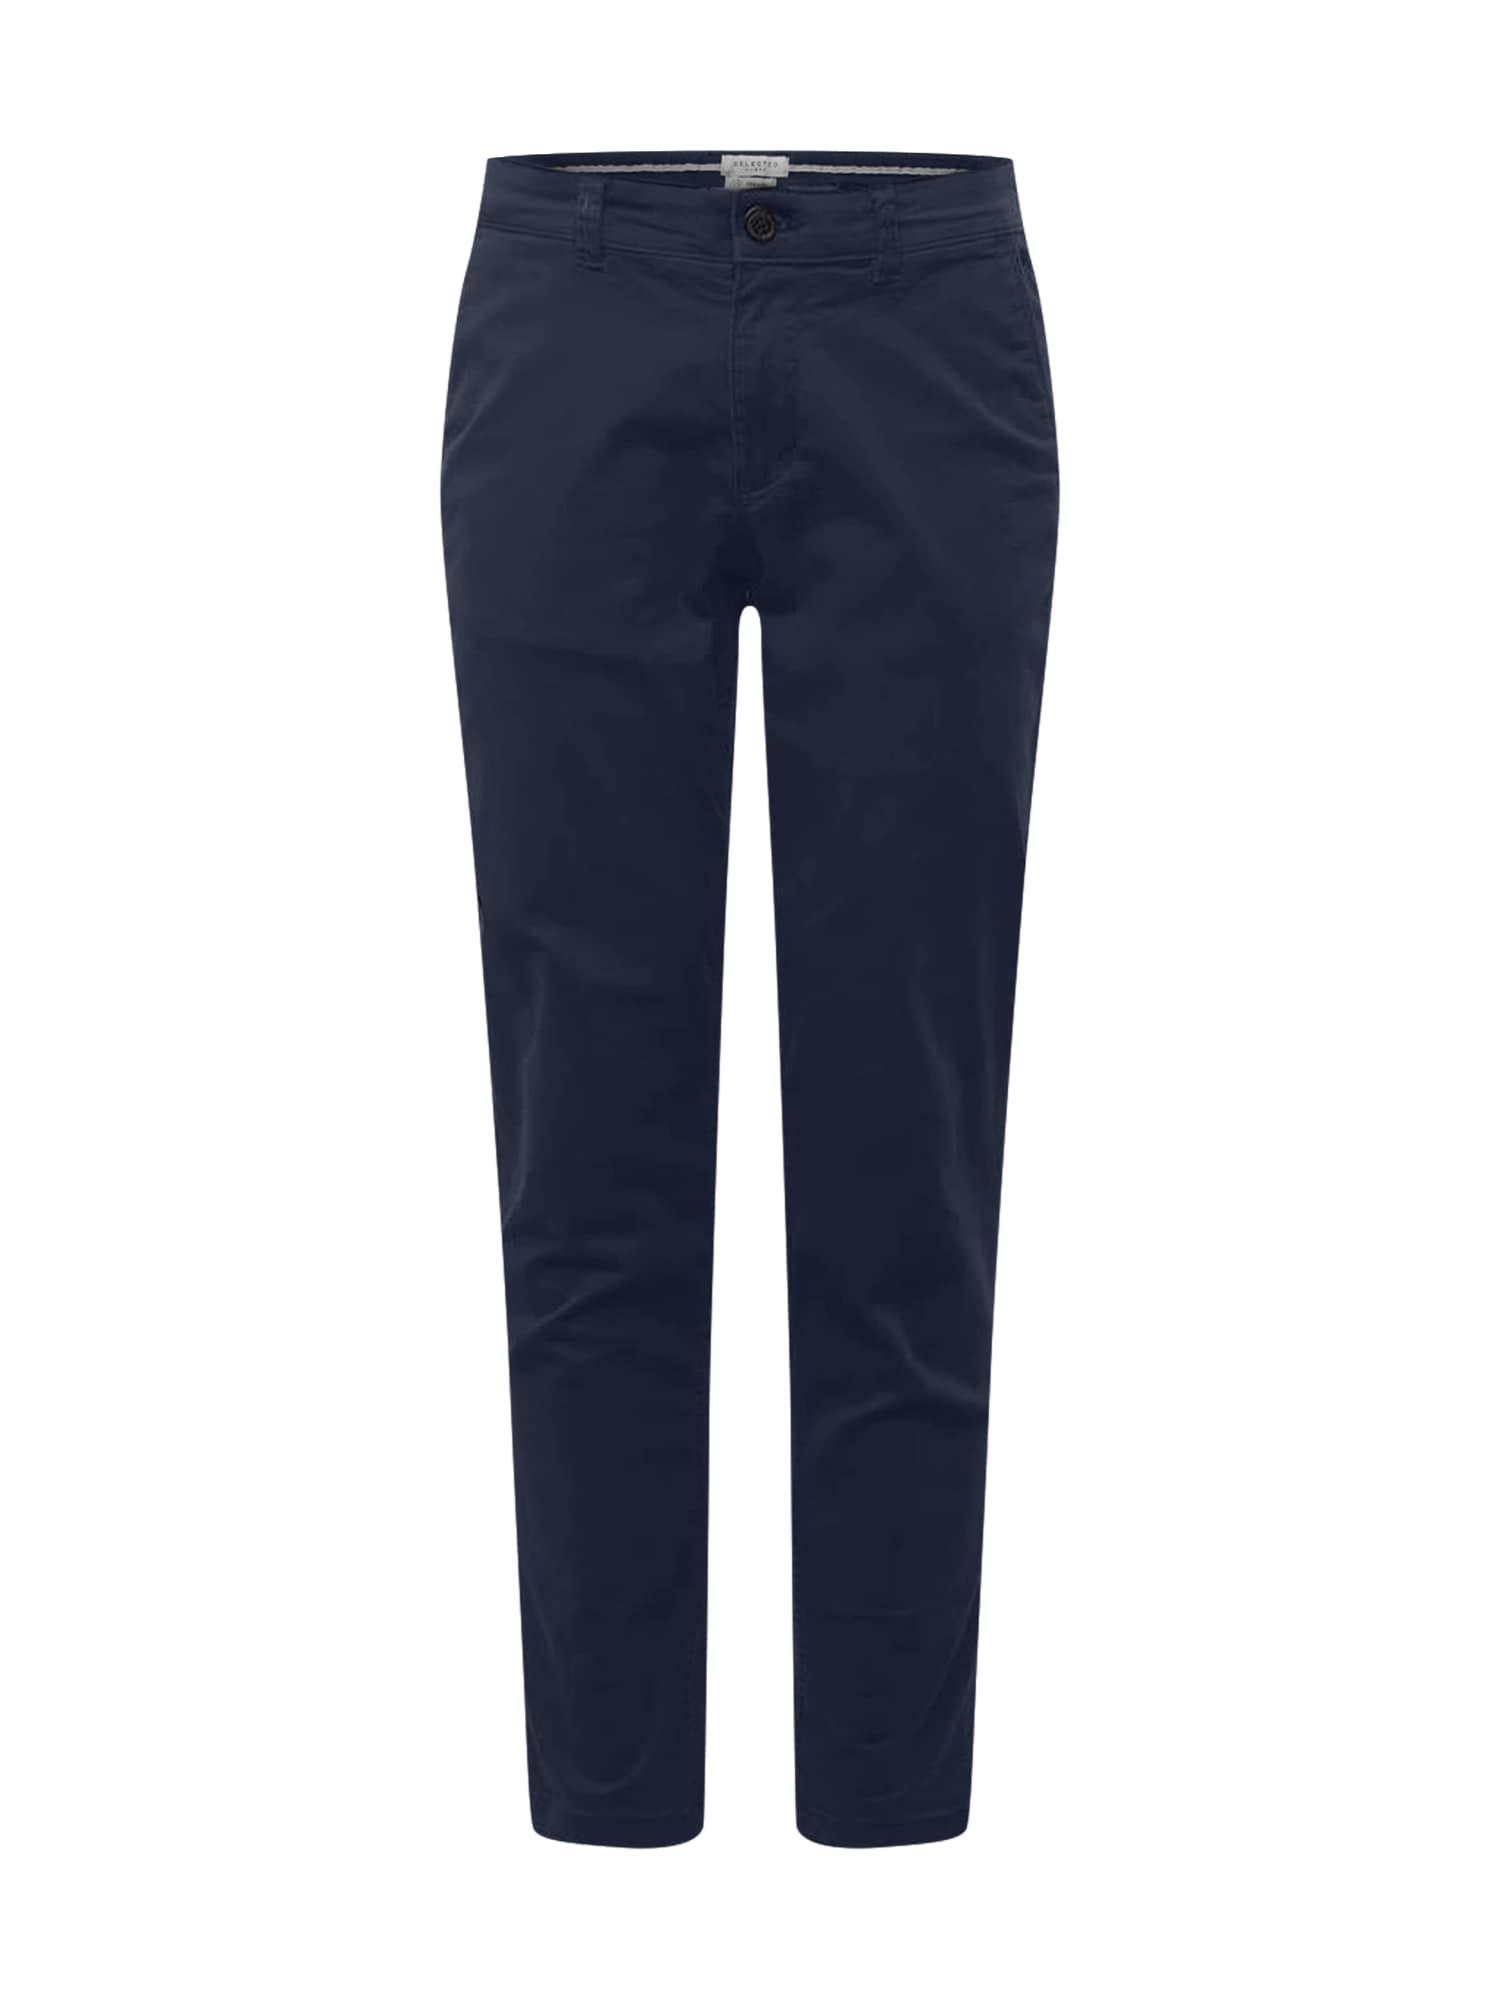 SELECTED HOMME Pantalon chino 'NEW PARIS'  - Bleu - Taille: 32 - male